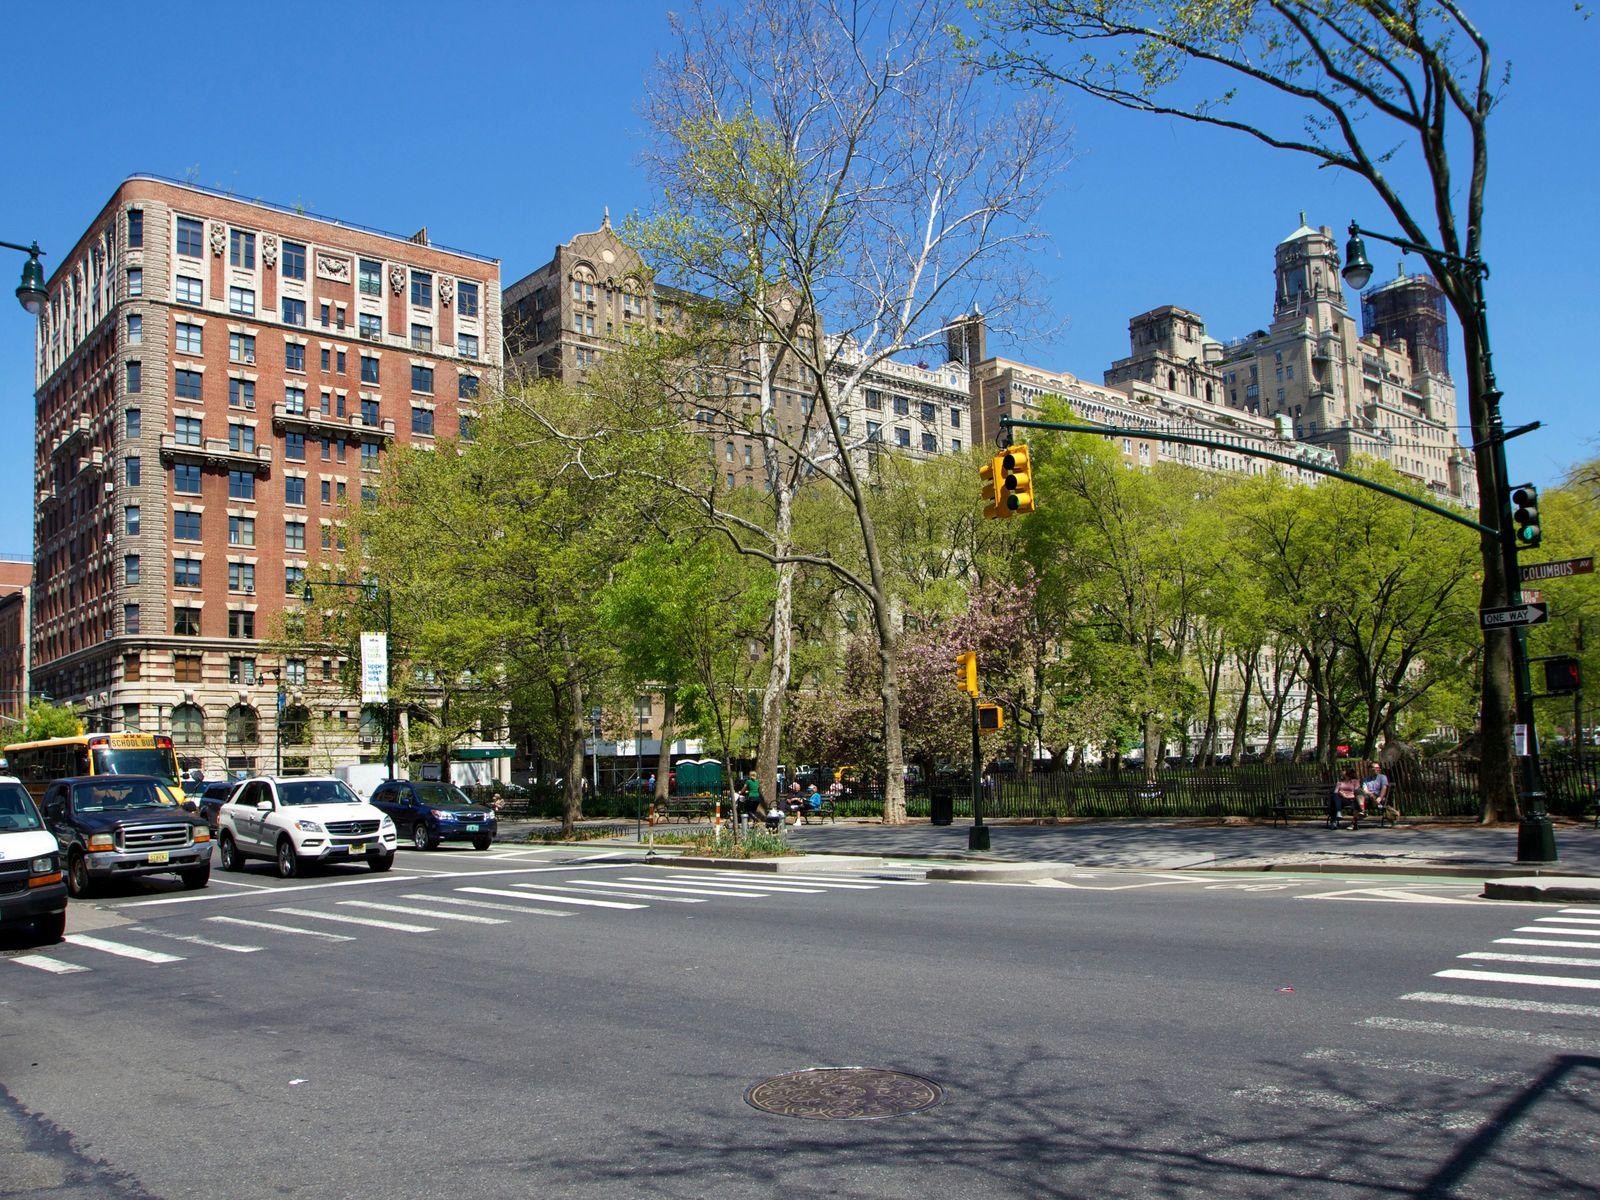 51 West 81st Street